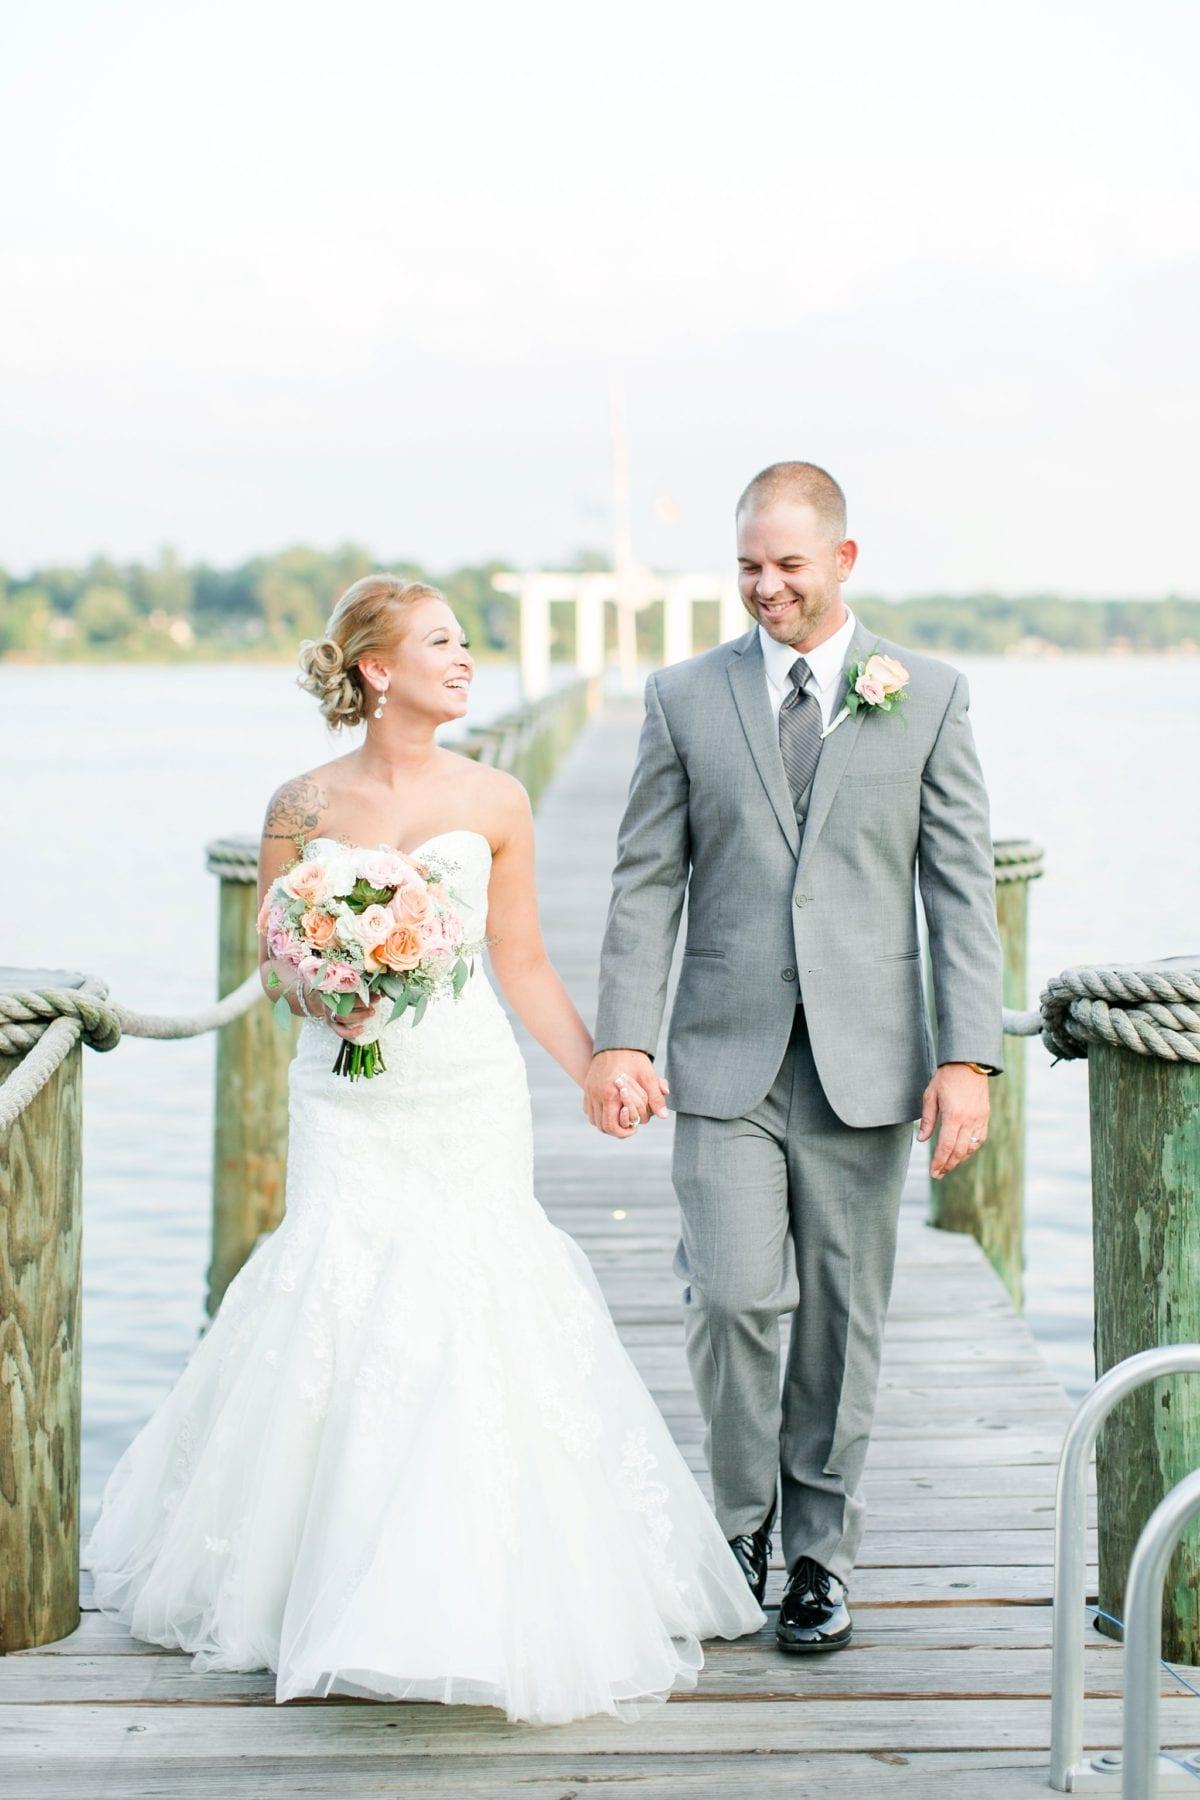 Waters Edge Wedding Photos Maryland Wedding Photographer Megan Kelsey Photography Katie & Conor-559.JPG